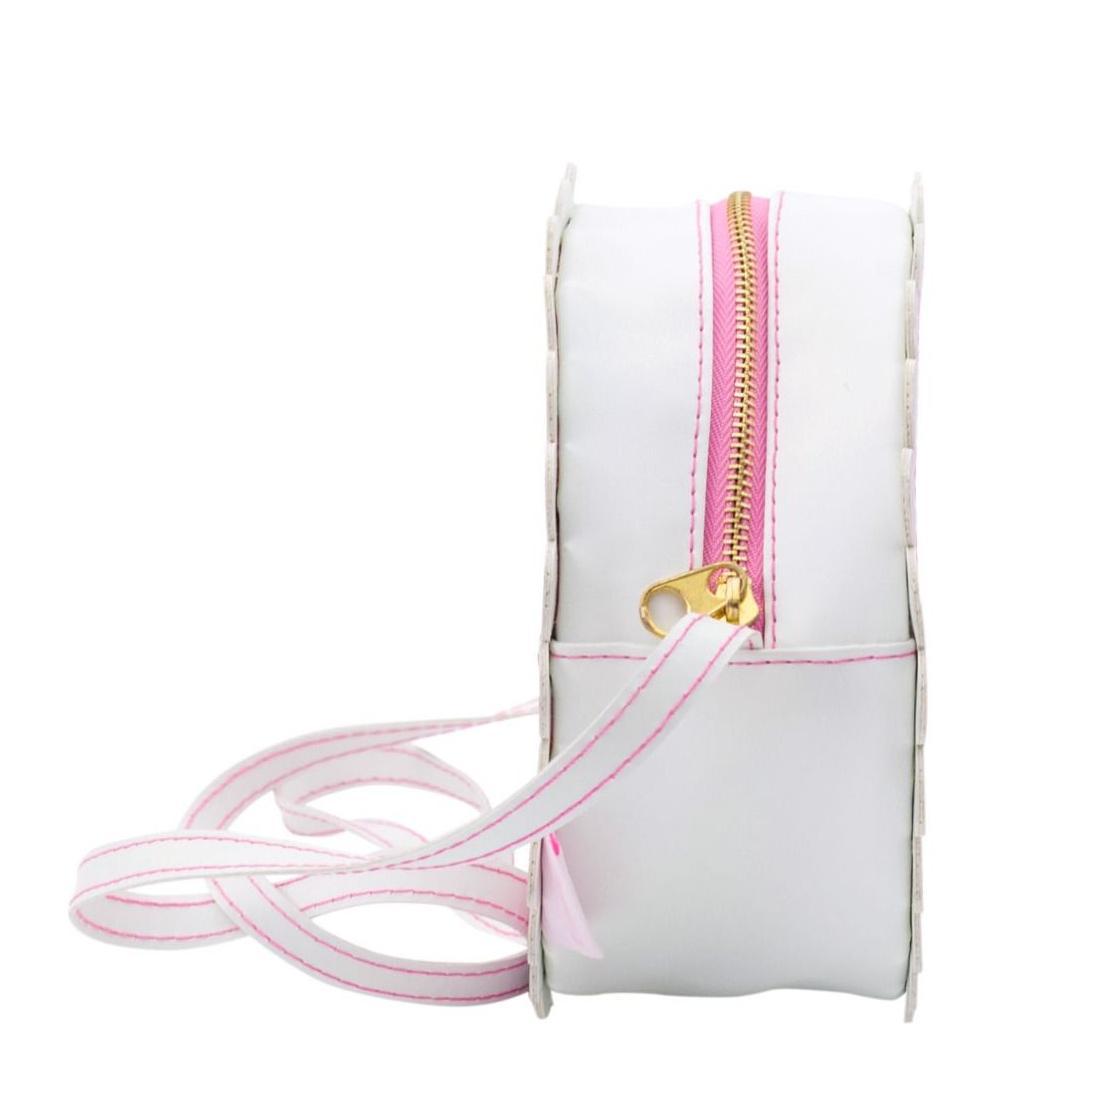 382697c1a89a Детская сумочка на длинном ремешке с павлином A Little Lovely Company,  розовая